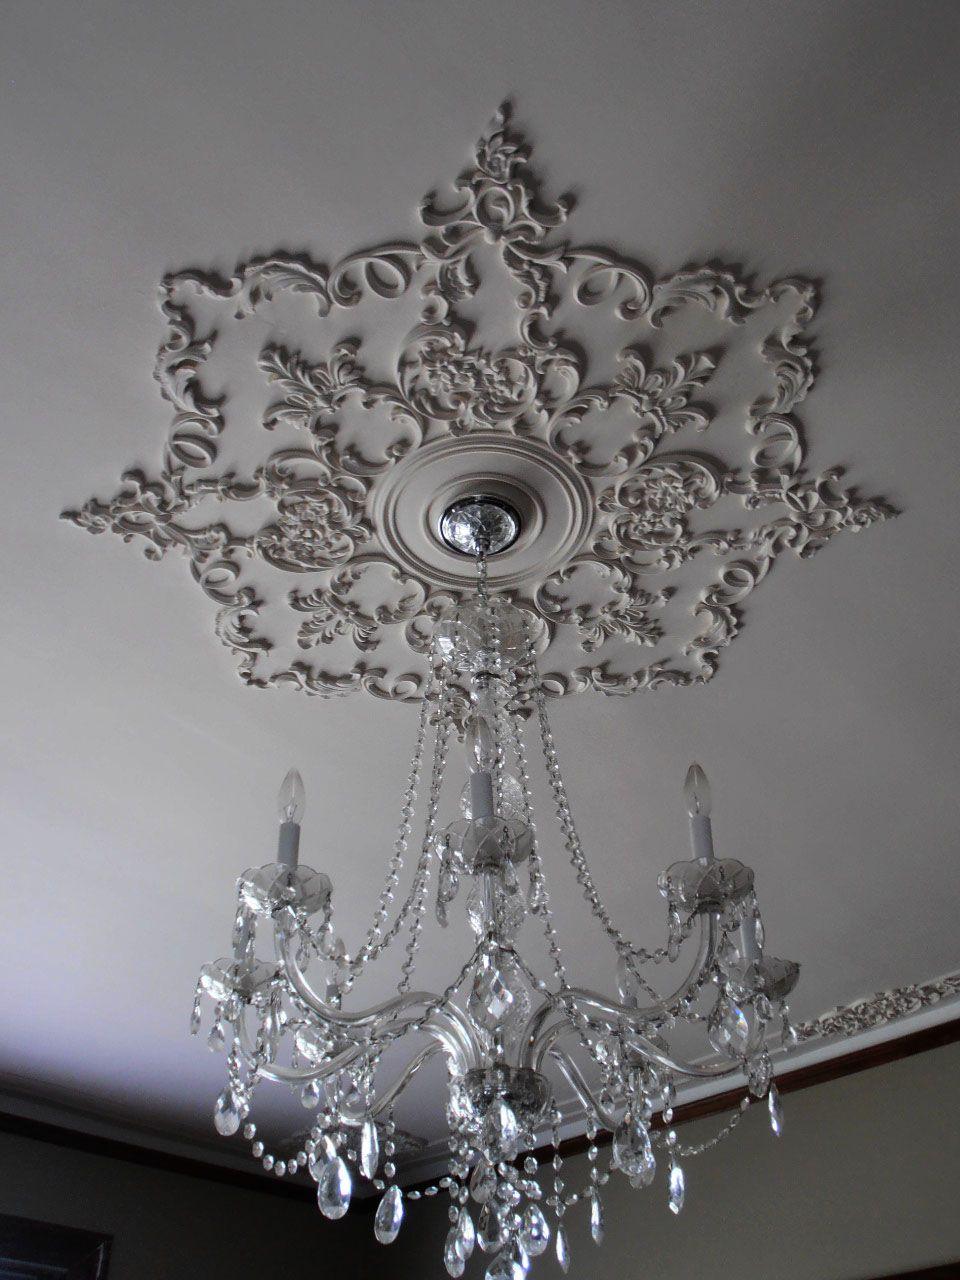 Custom Ceiling Medallion By Renaissanceornamental Com Ceiling Medallions Victorian Ceiling Medallions Home Ceiling